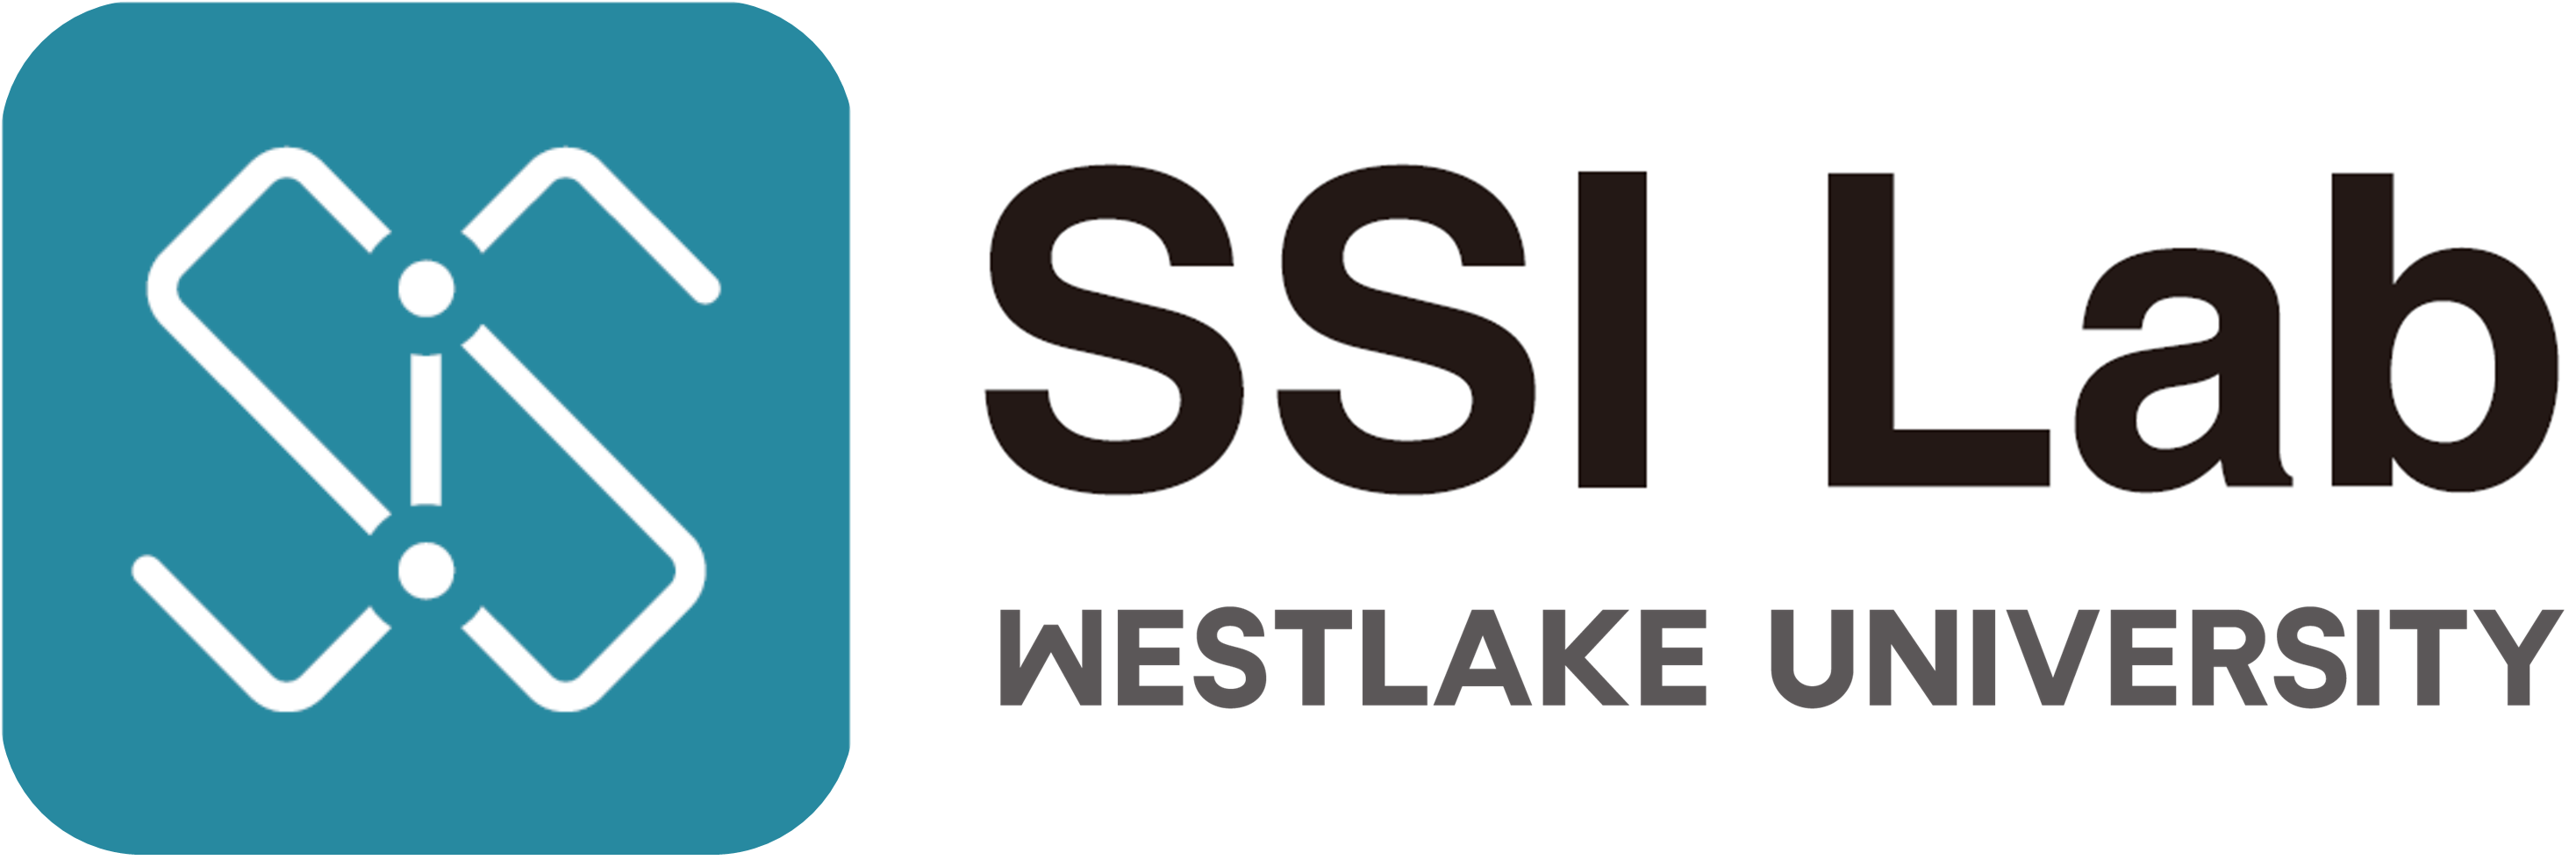 Solid State Ionics Lab@Westlake University